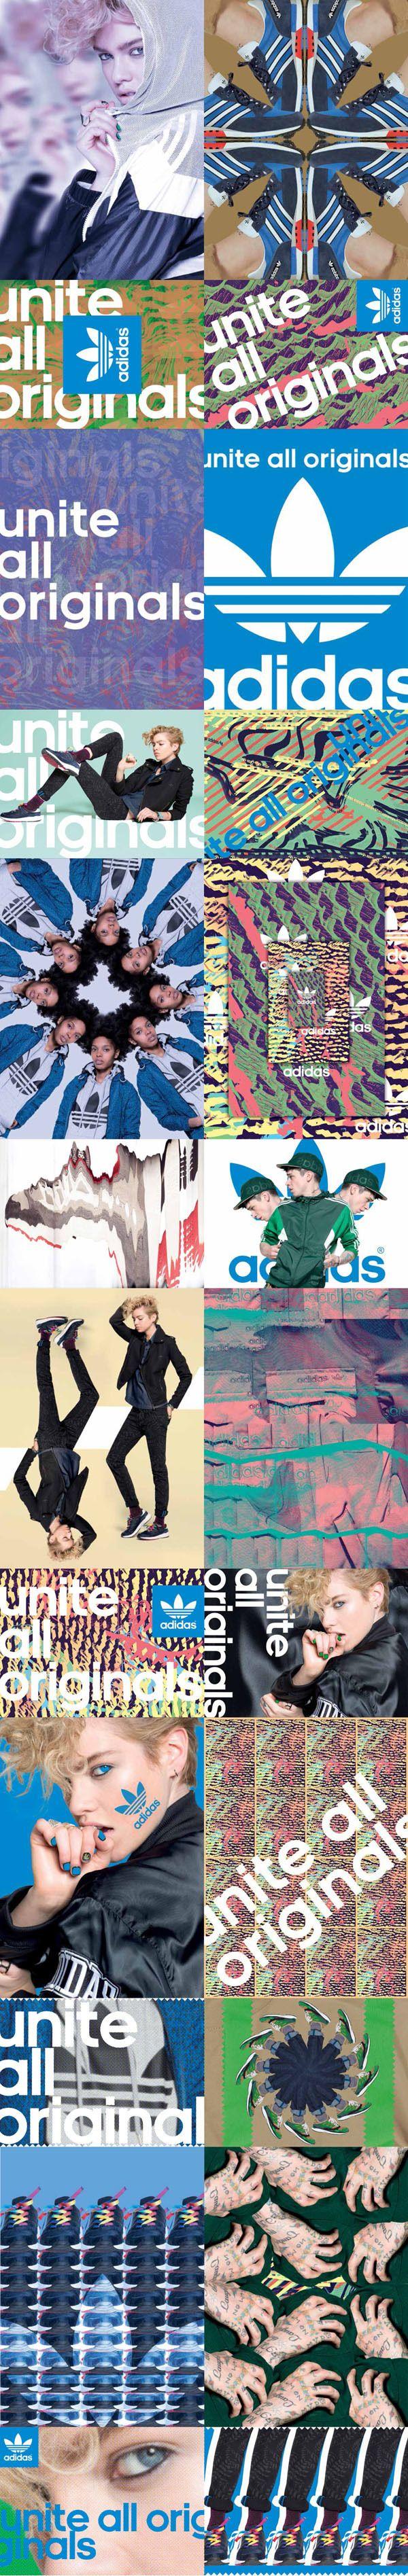 Fachada adidas Originals on Behance